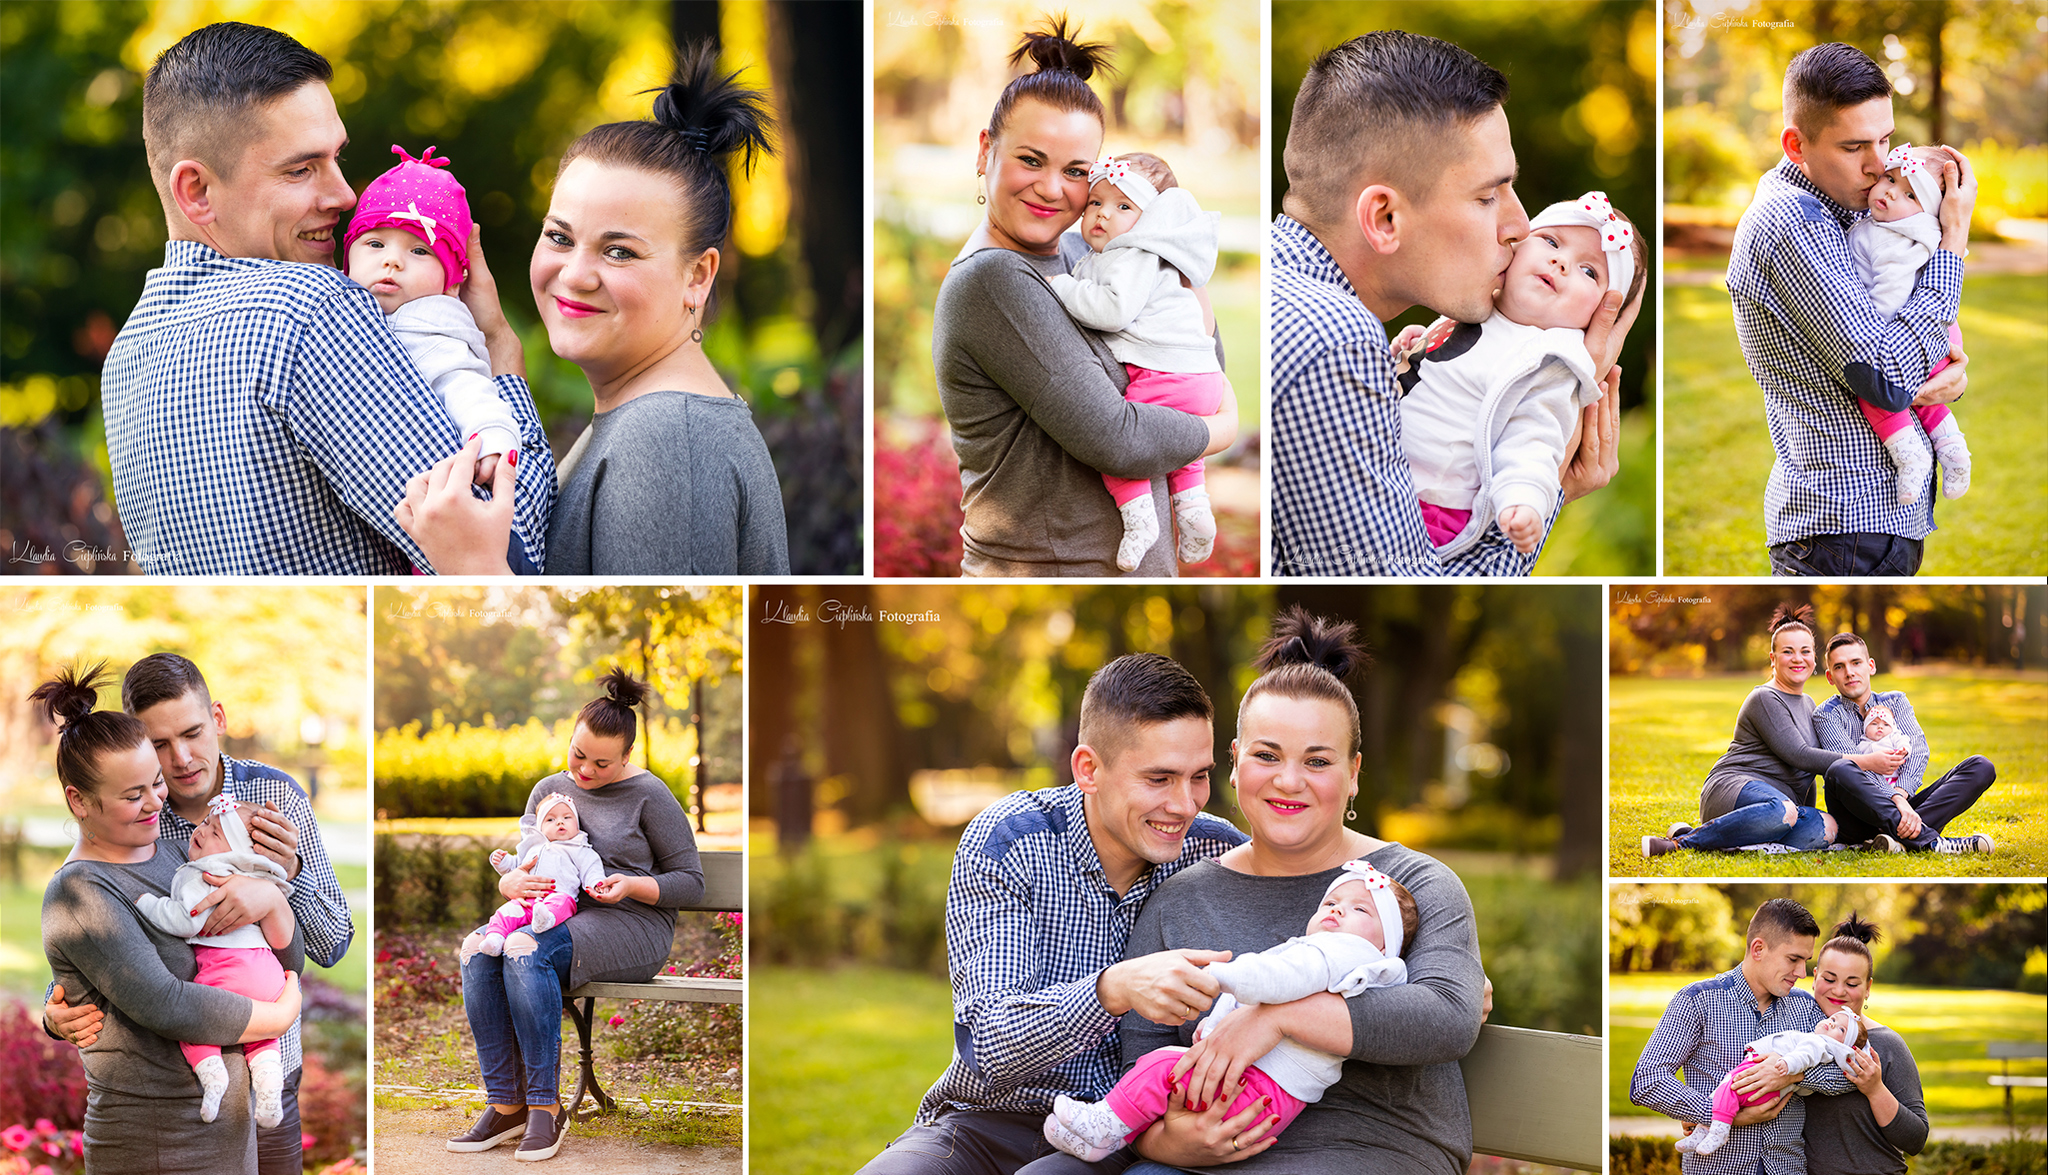 rodzinna sesja zdjęciowa - Klaudia Cieplińska - fotografia